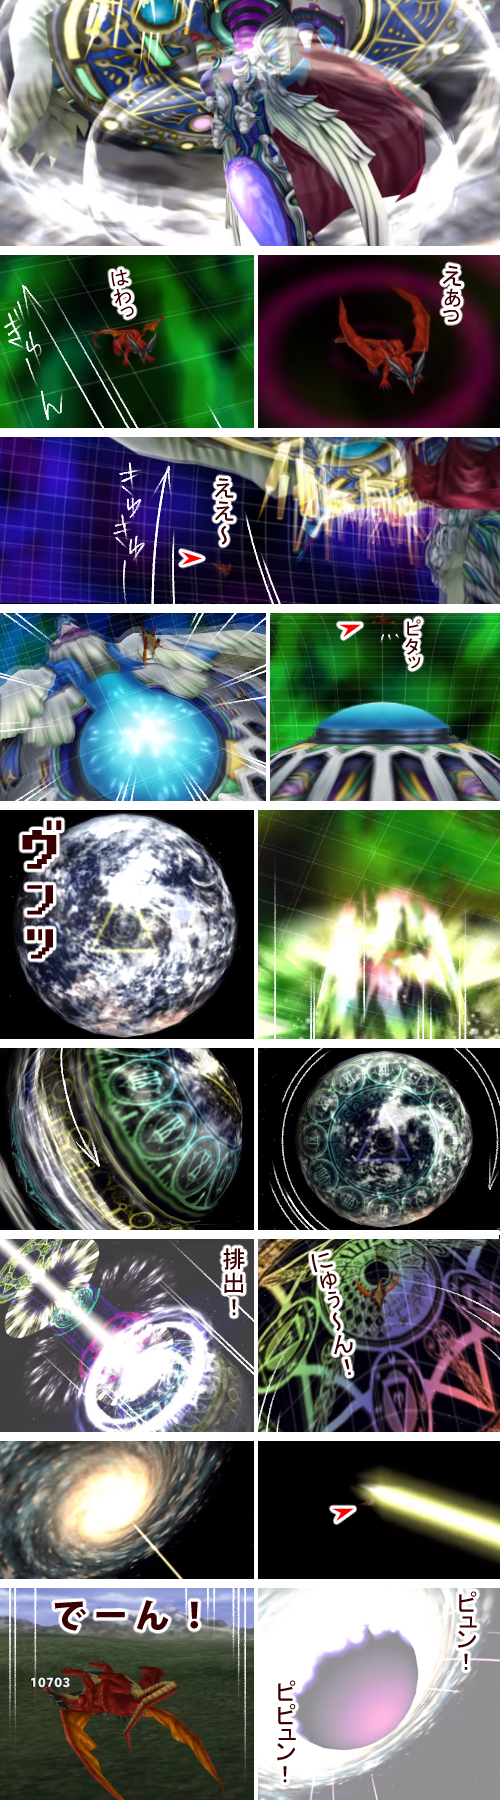 FF8G.F.「エデン」の召喚シーン2